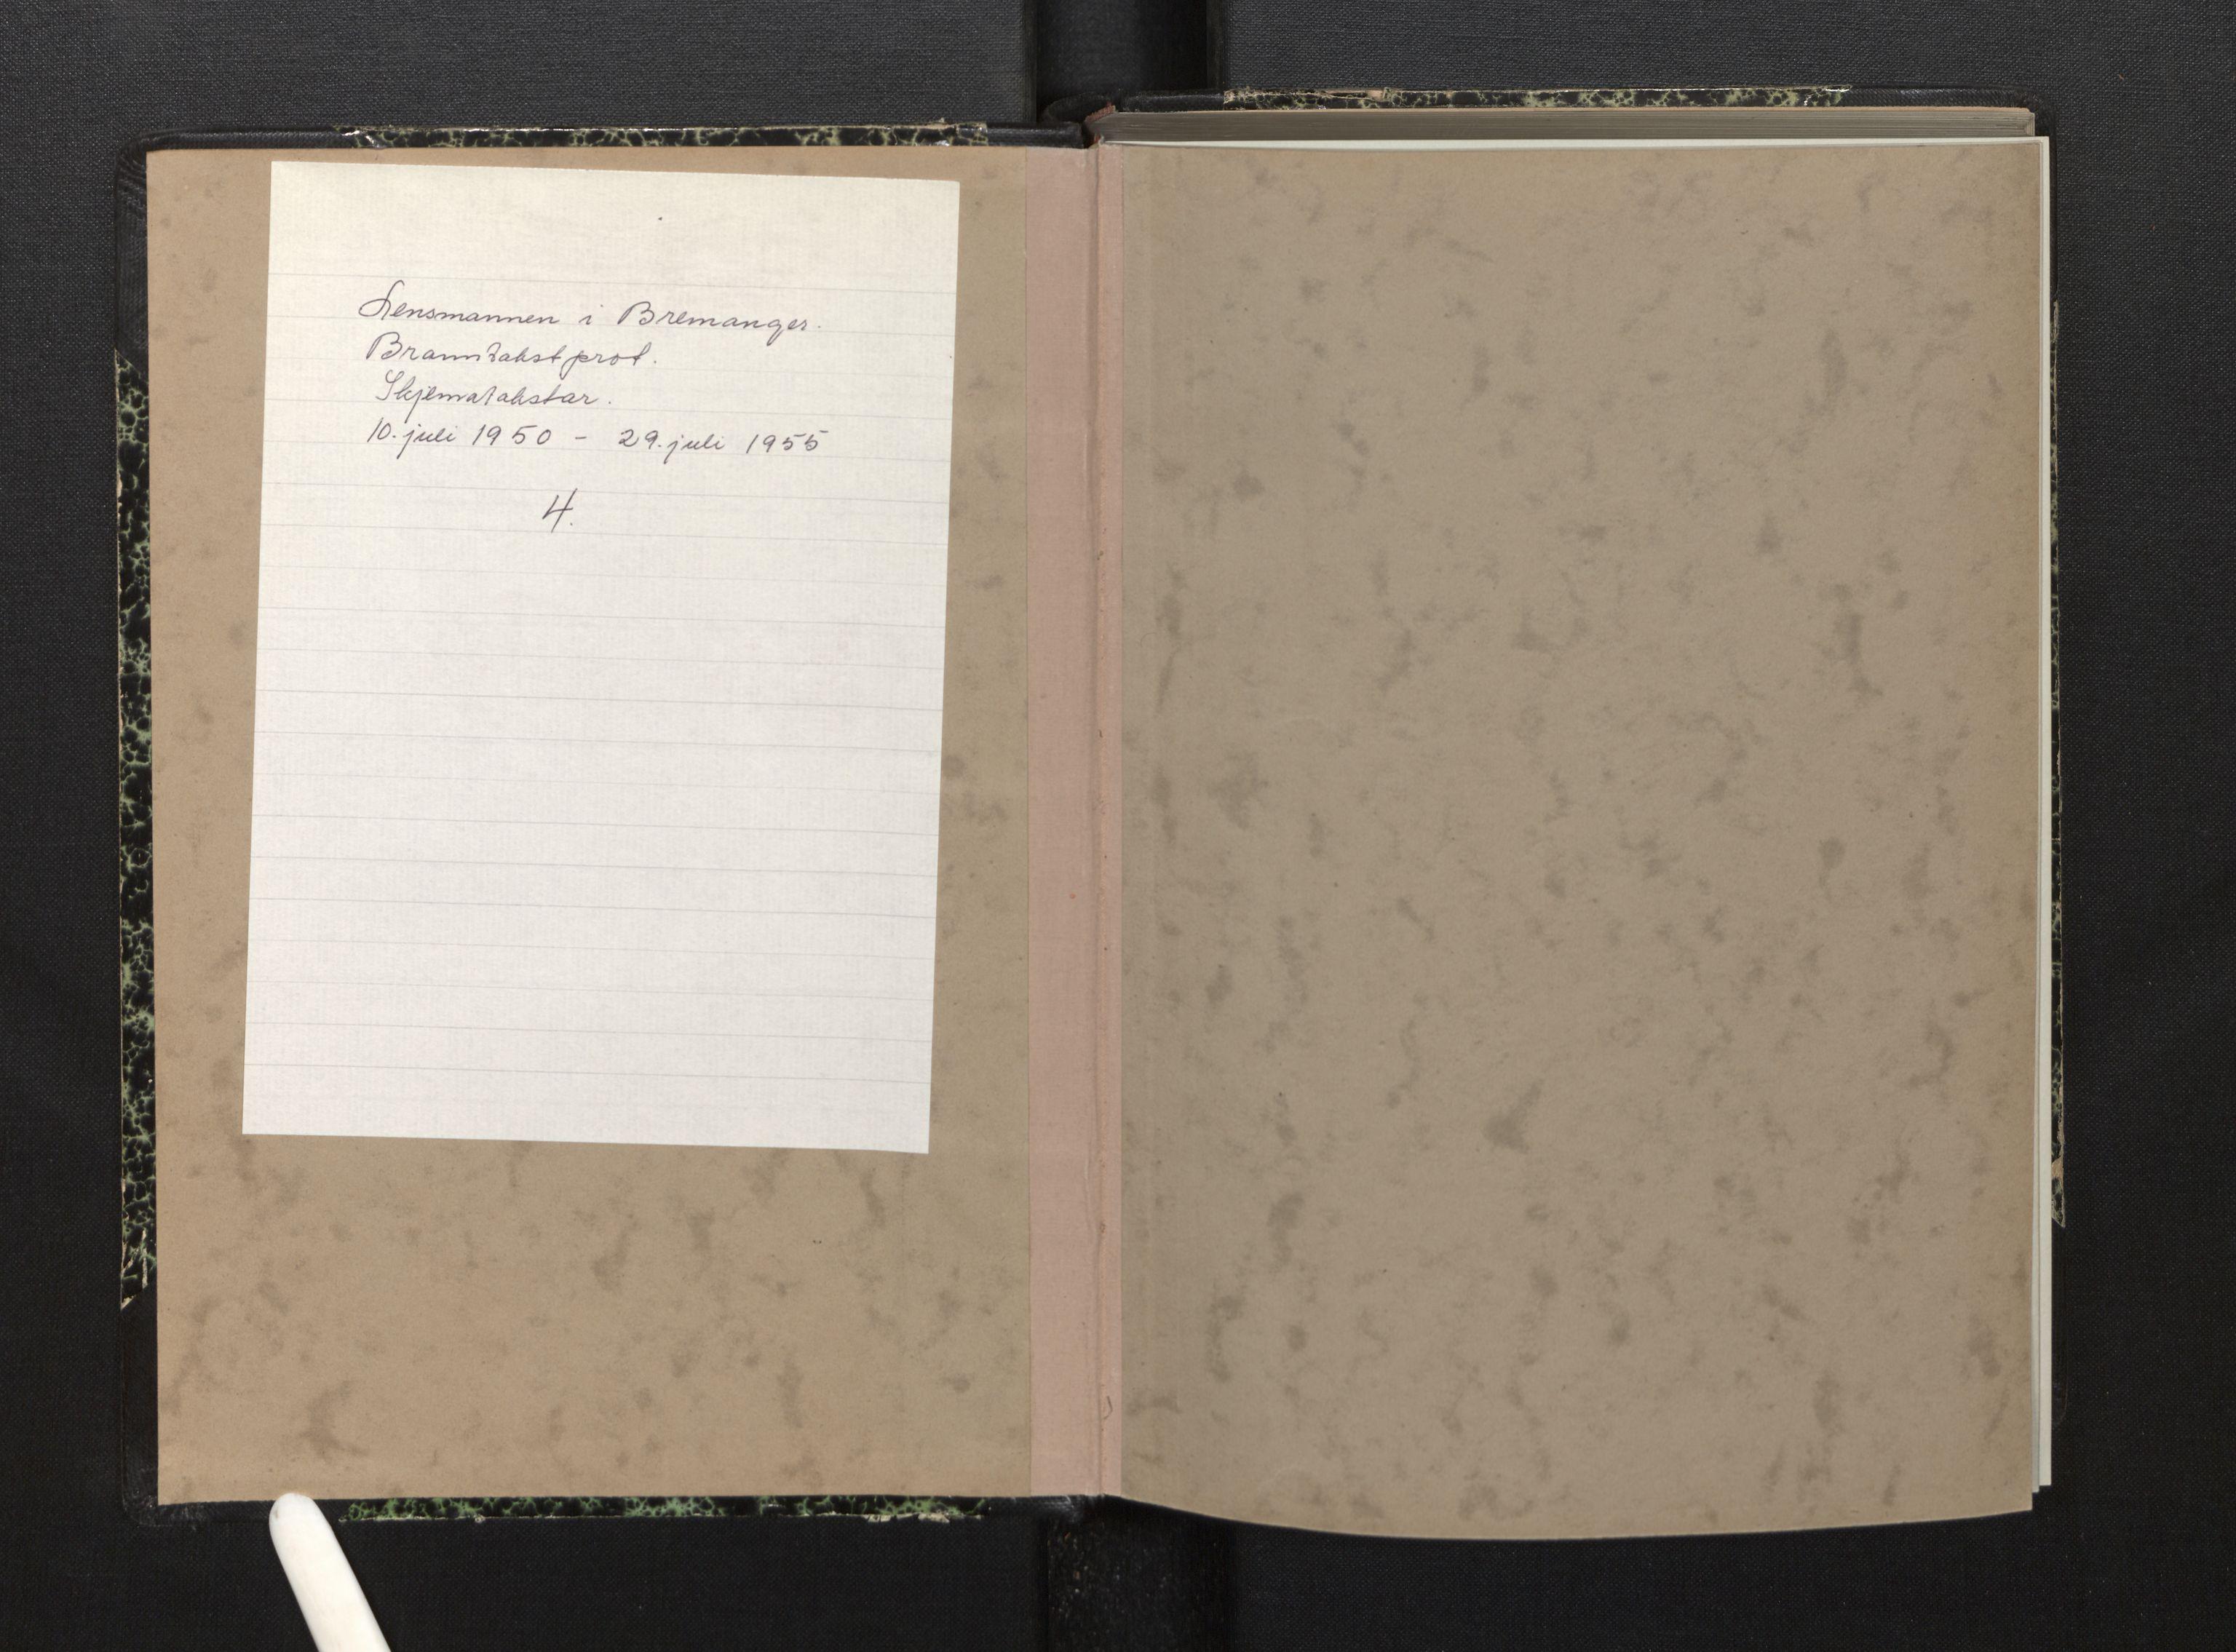 SAB, Lensmannen i Bremanger, 0012/L0010: Branntakstprotokoll, skjematakst, 1950-1955